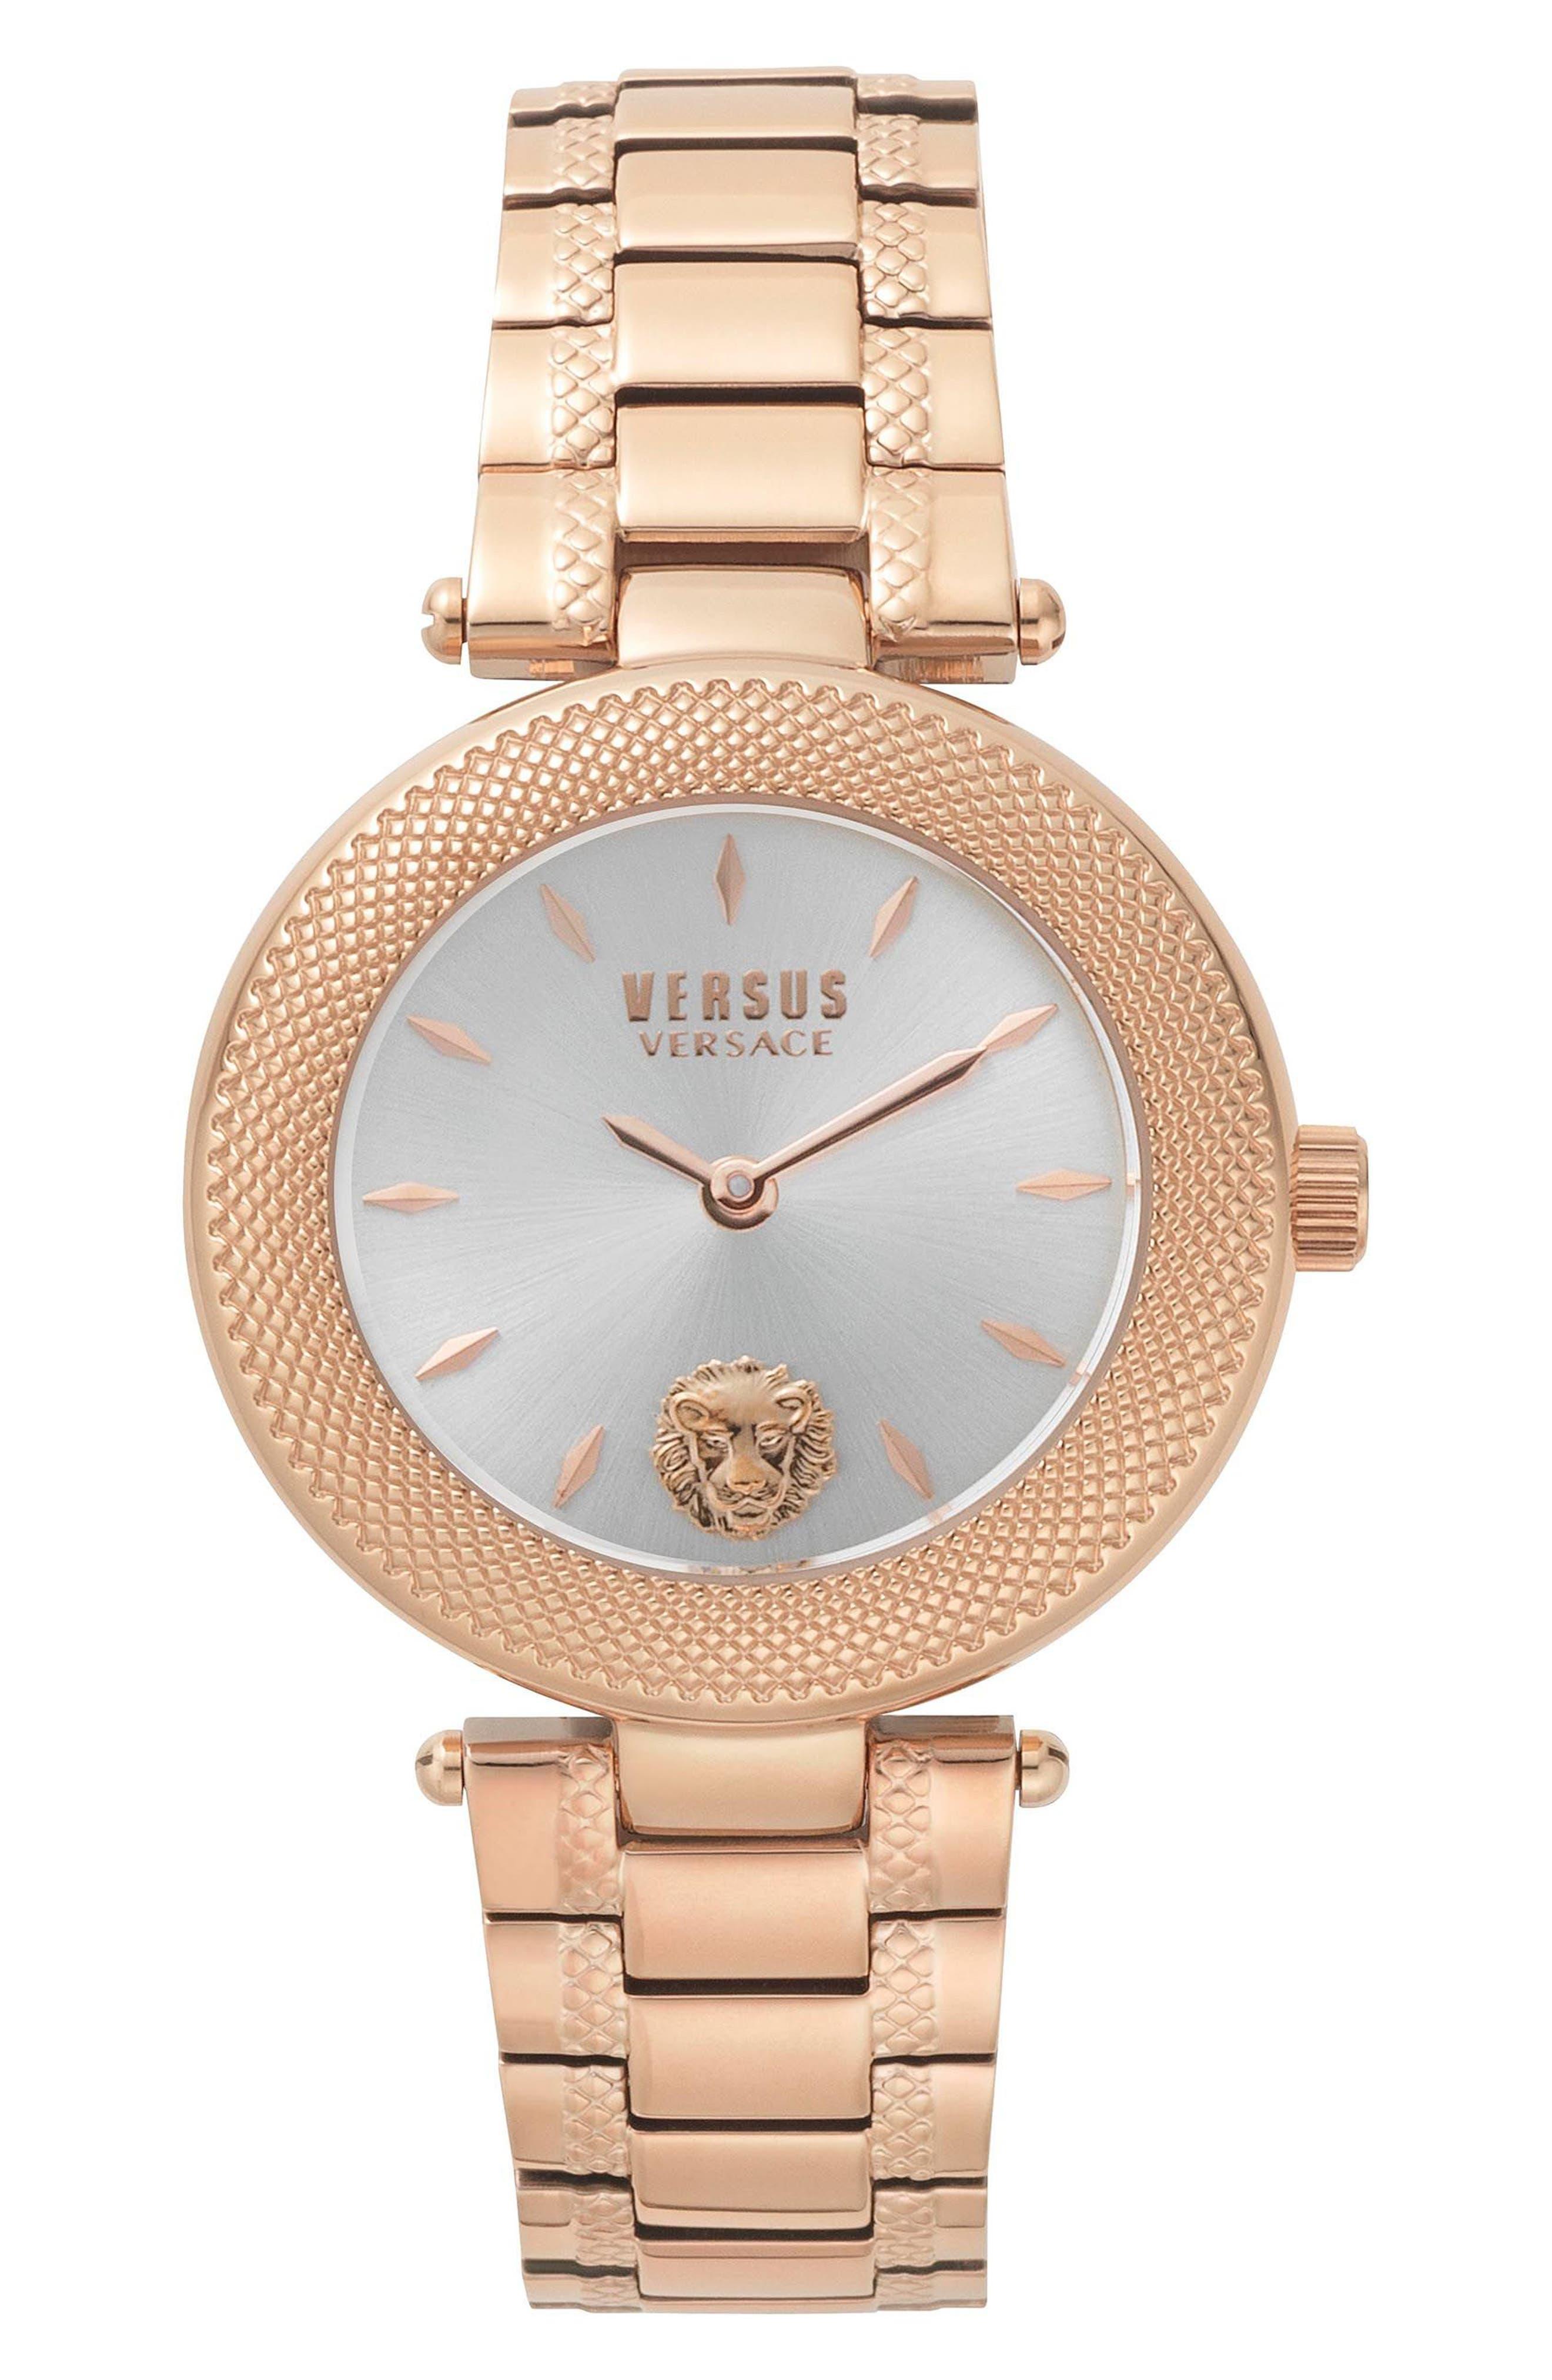 VERSUS VERSACE Bricklane Watch Set, 36mm, Main, color, ROSE GOLD/ SILVER